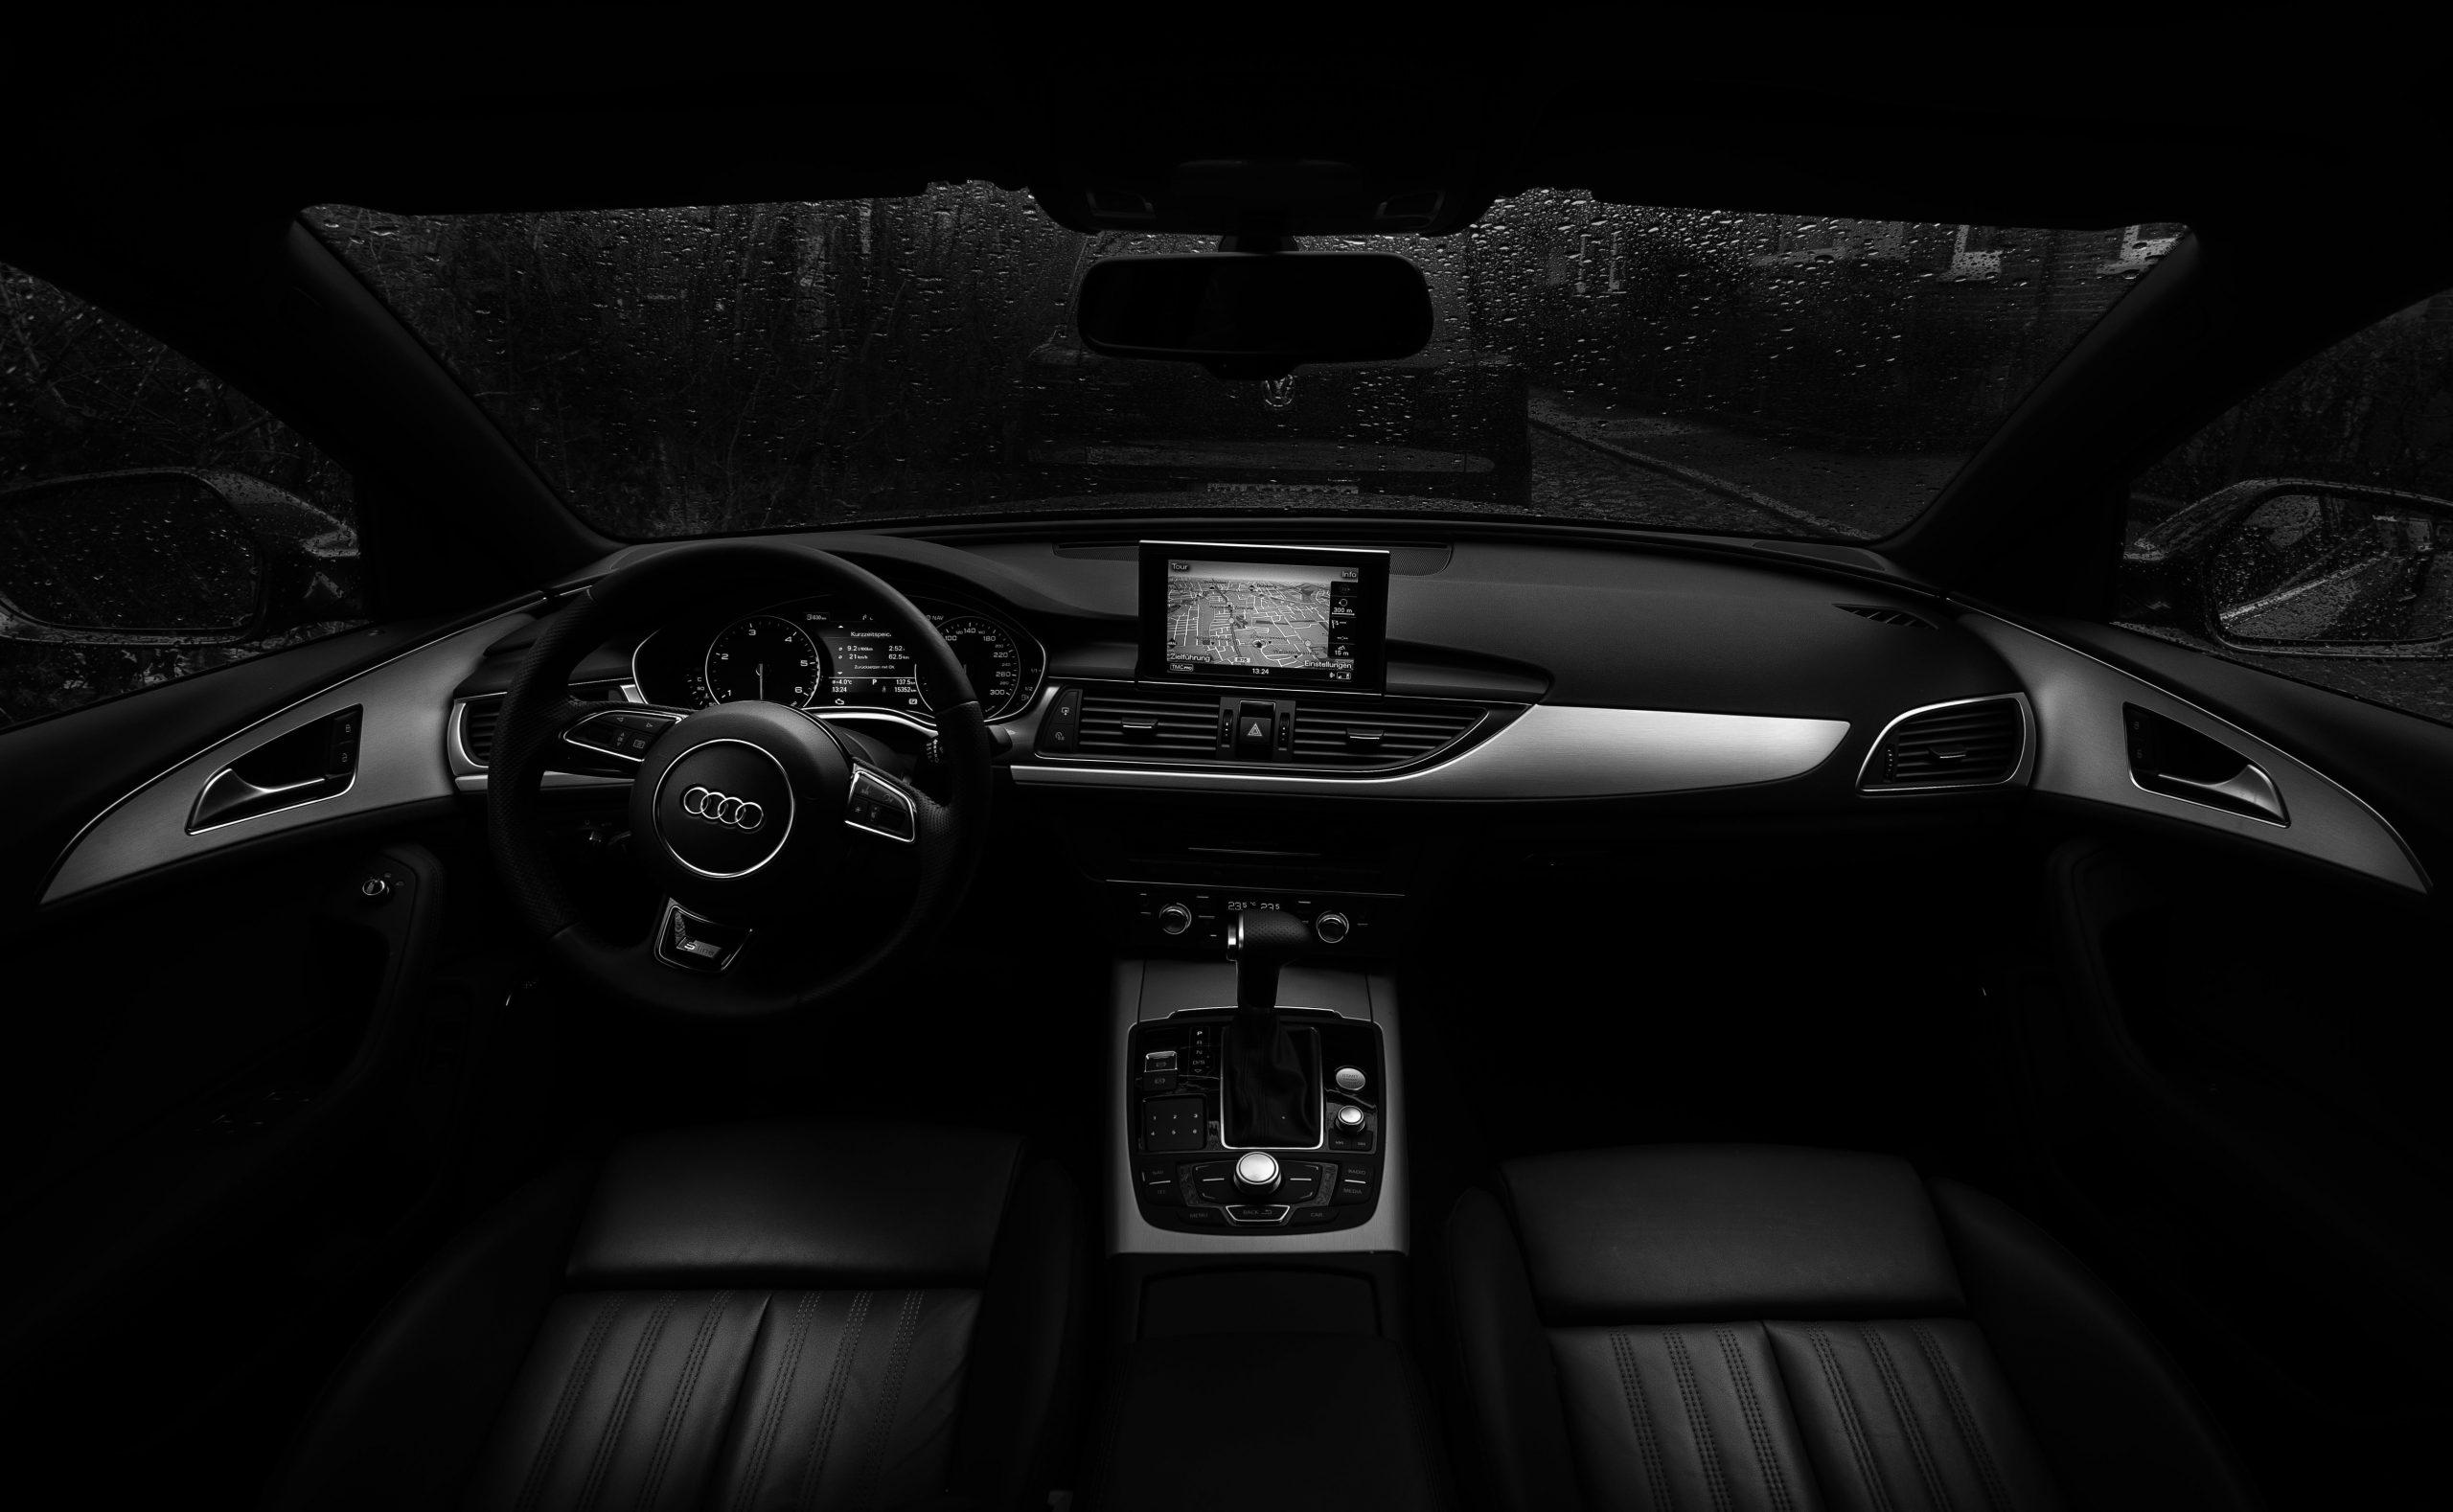 Focus St Vs Gti >> Audi A4 B9 - der Neue aus Ingolstadt - Motormagazin.com